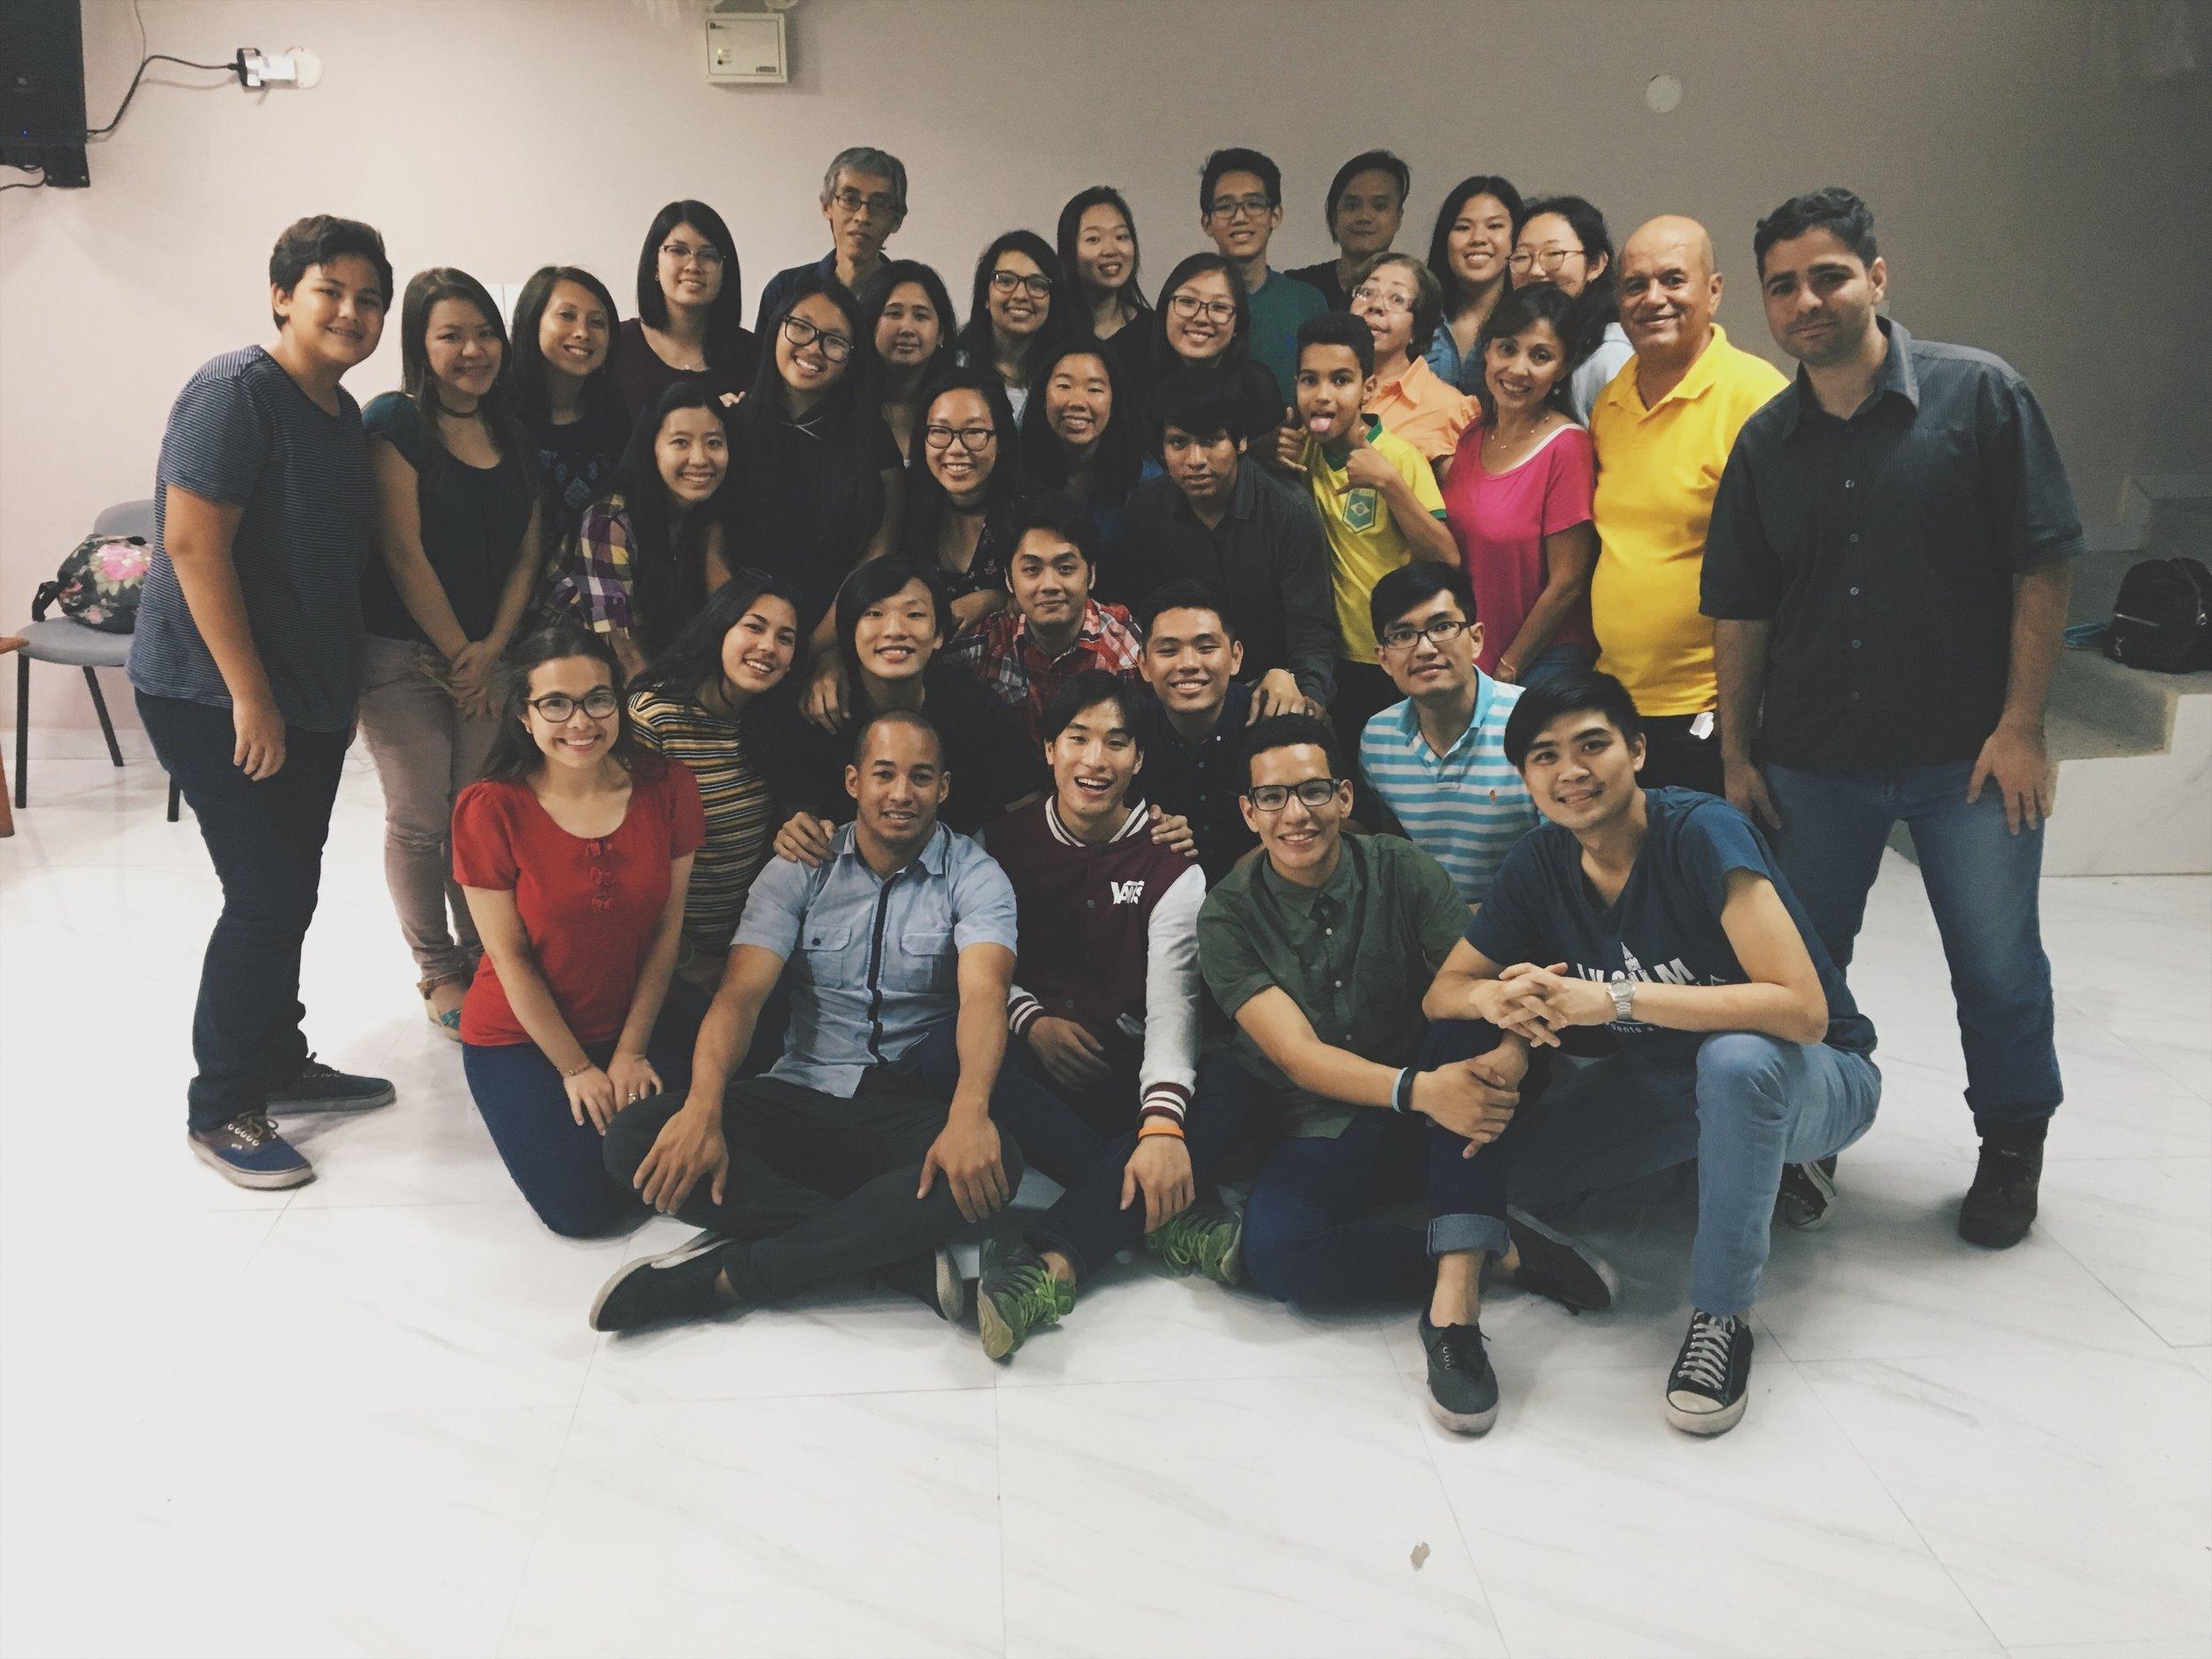 Youth group at Iglesia Bautista China de Caracas